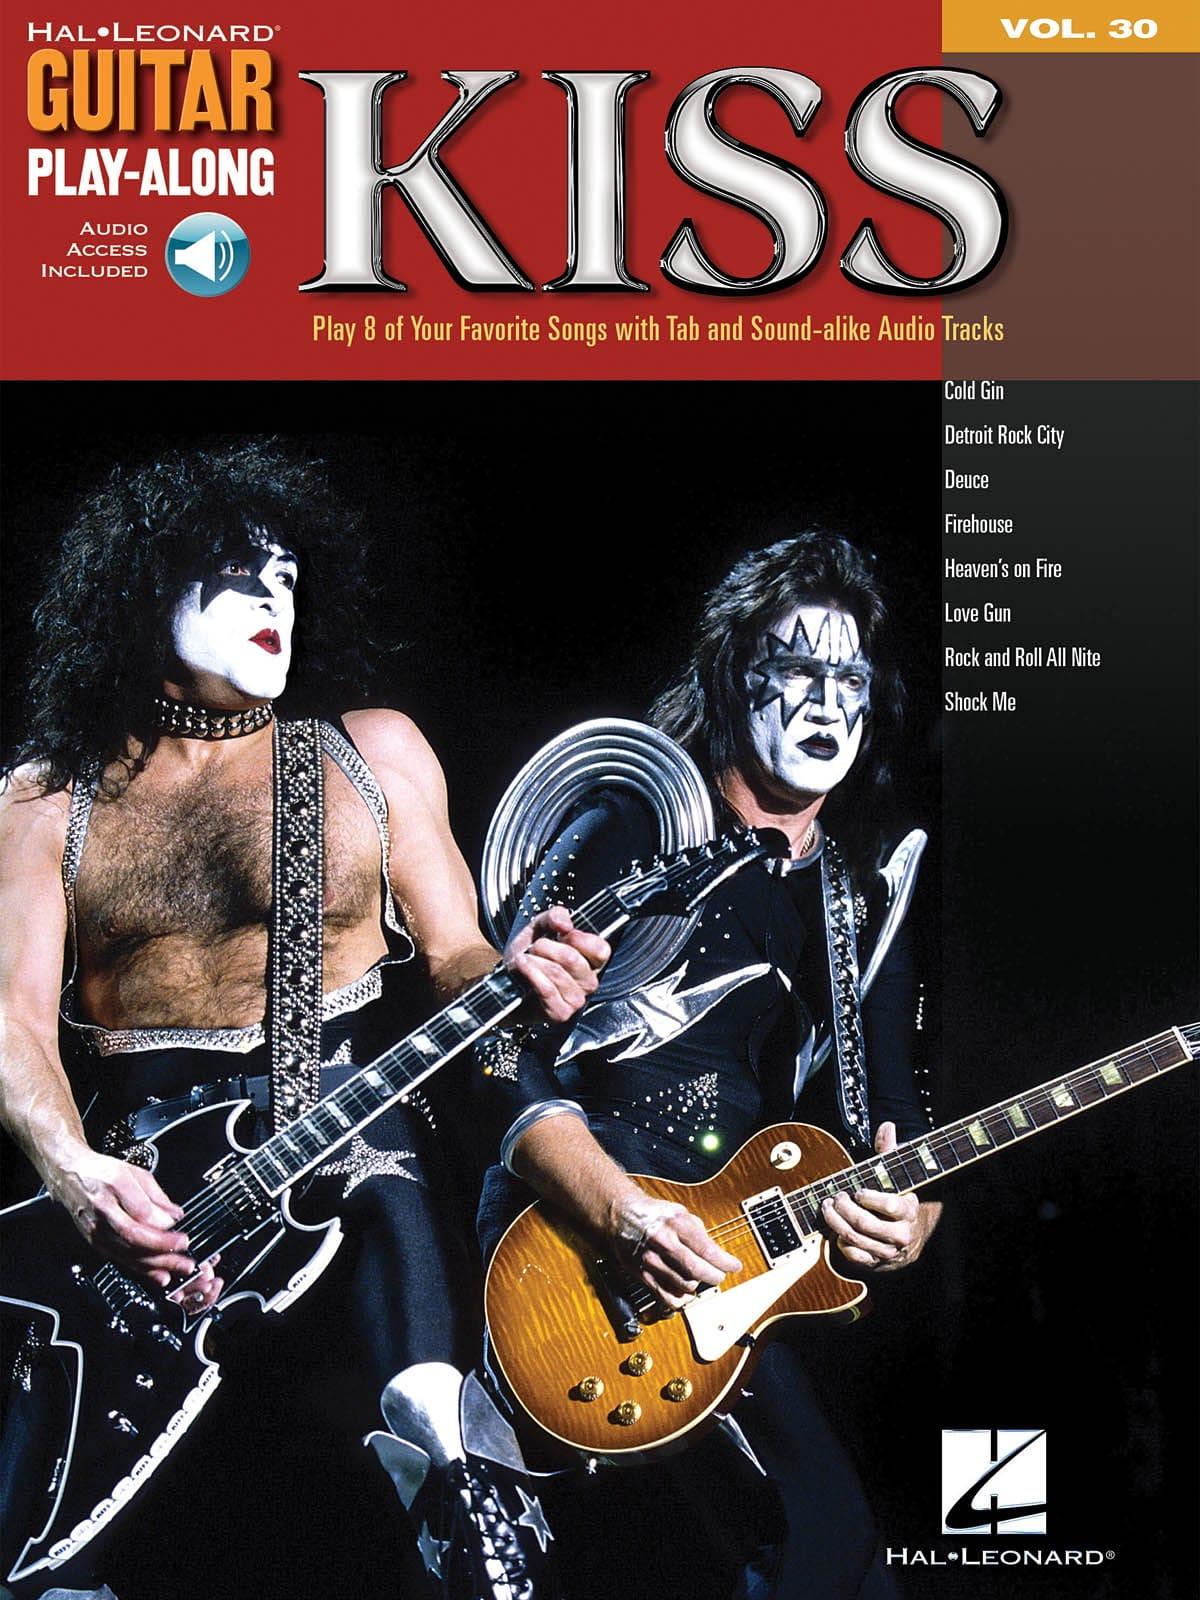 Guitar Play-Along Volume 30 - Kiss - Kiss - laflutedepan.com